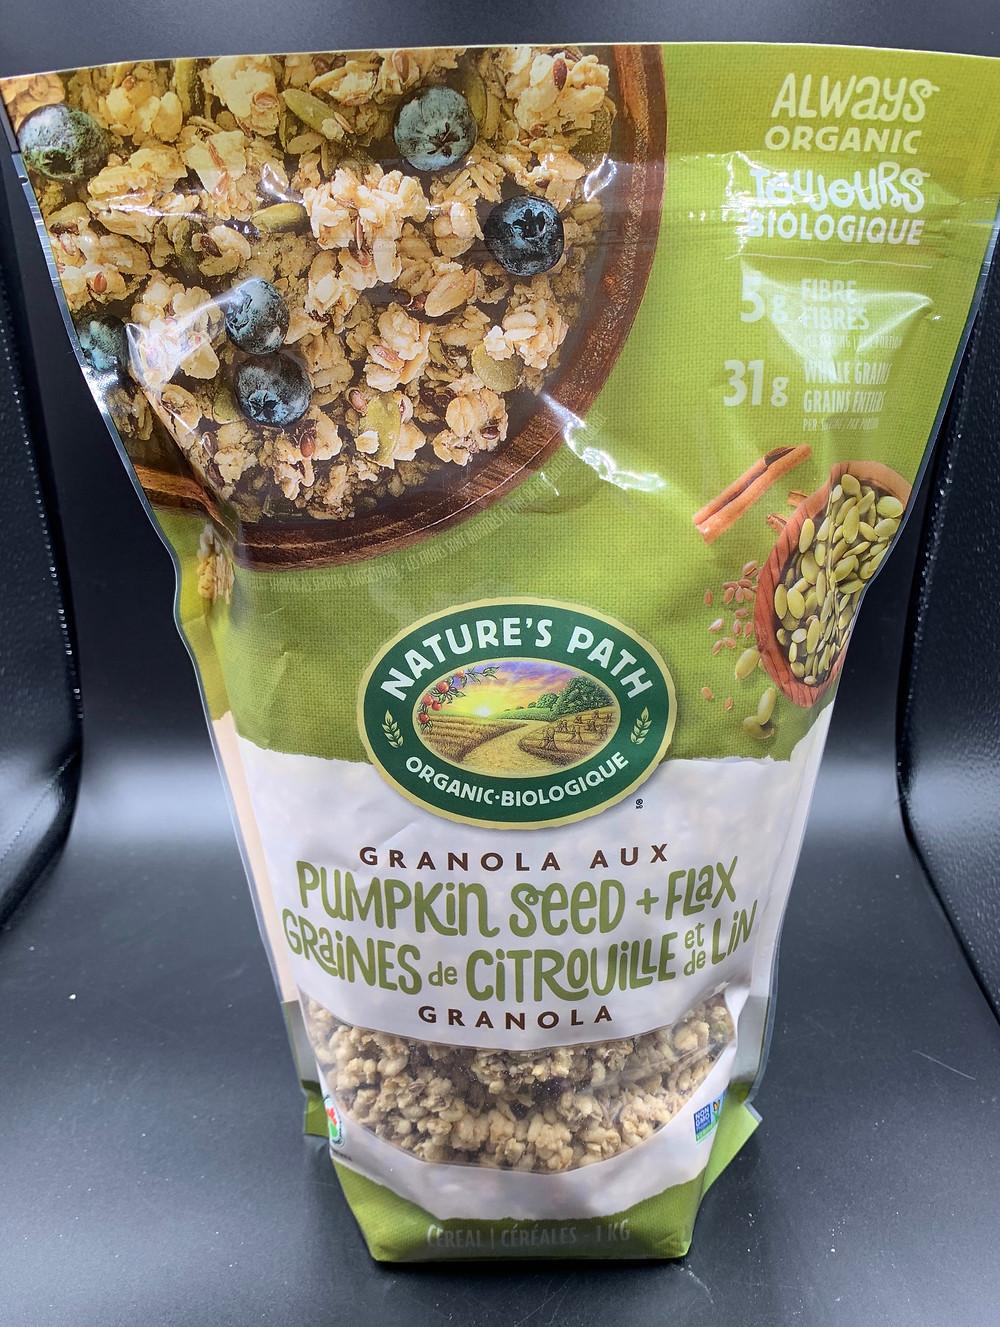 Costco Nature's Path Organic Pumpkin Seed and Flax Granola